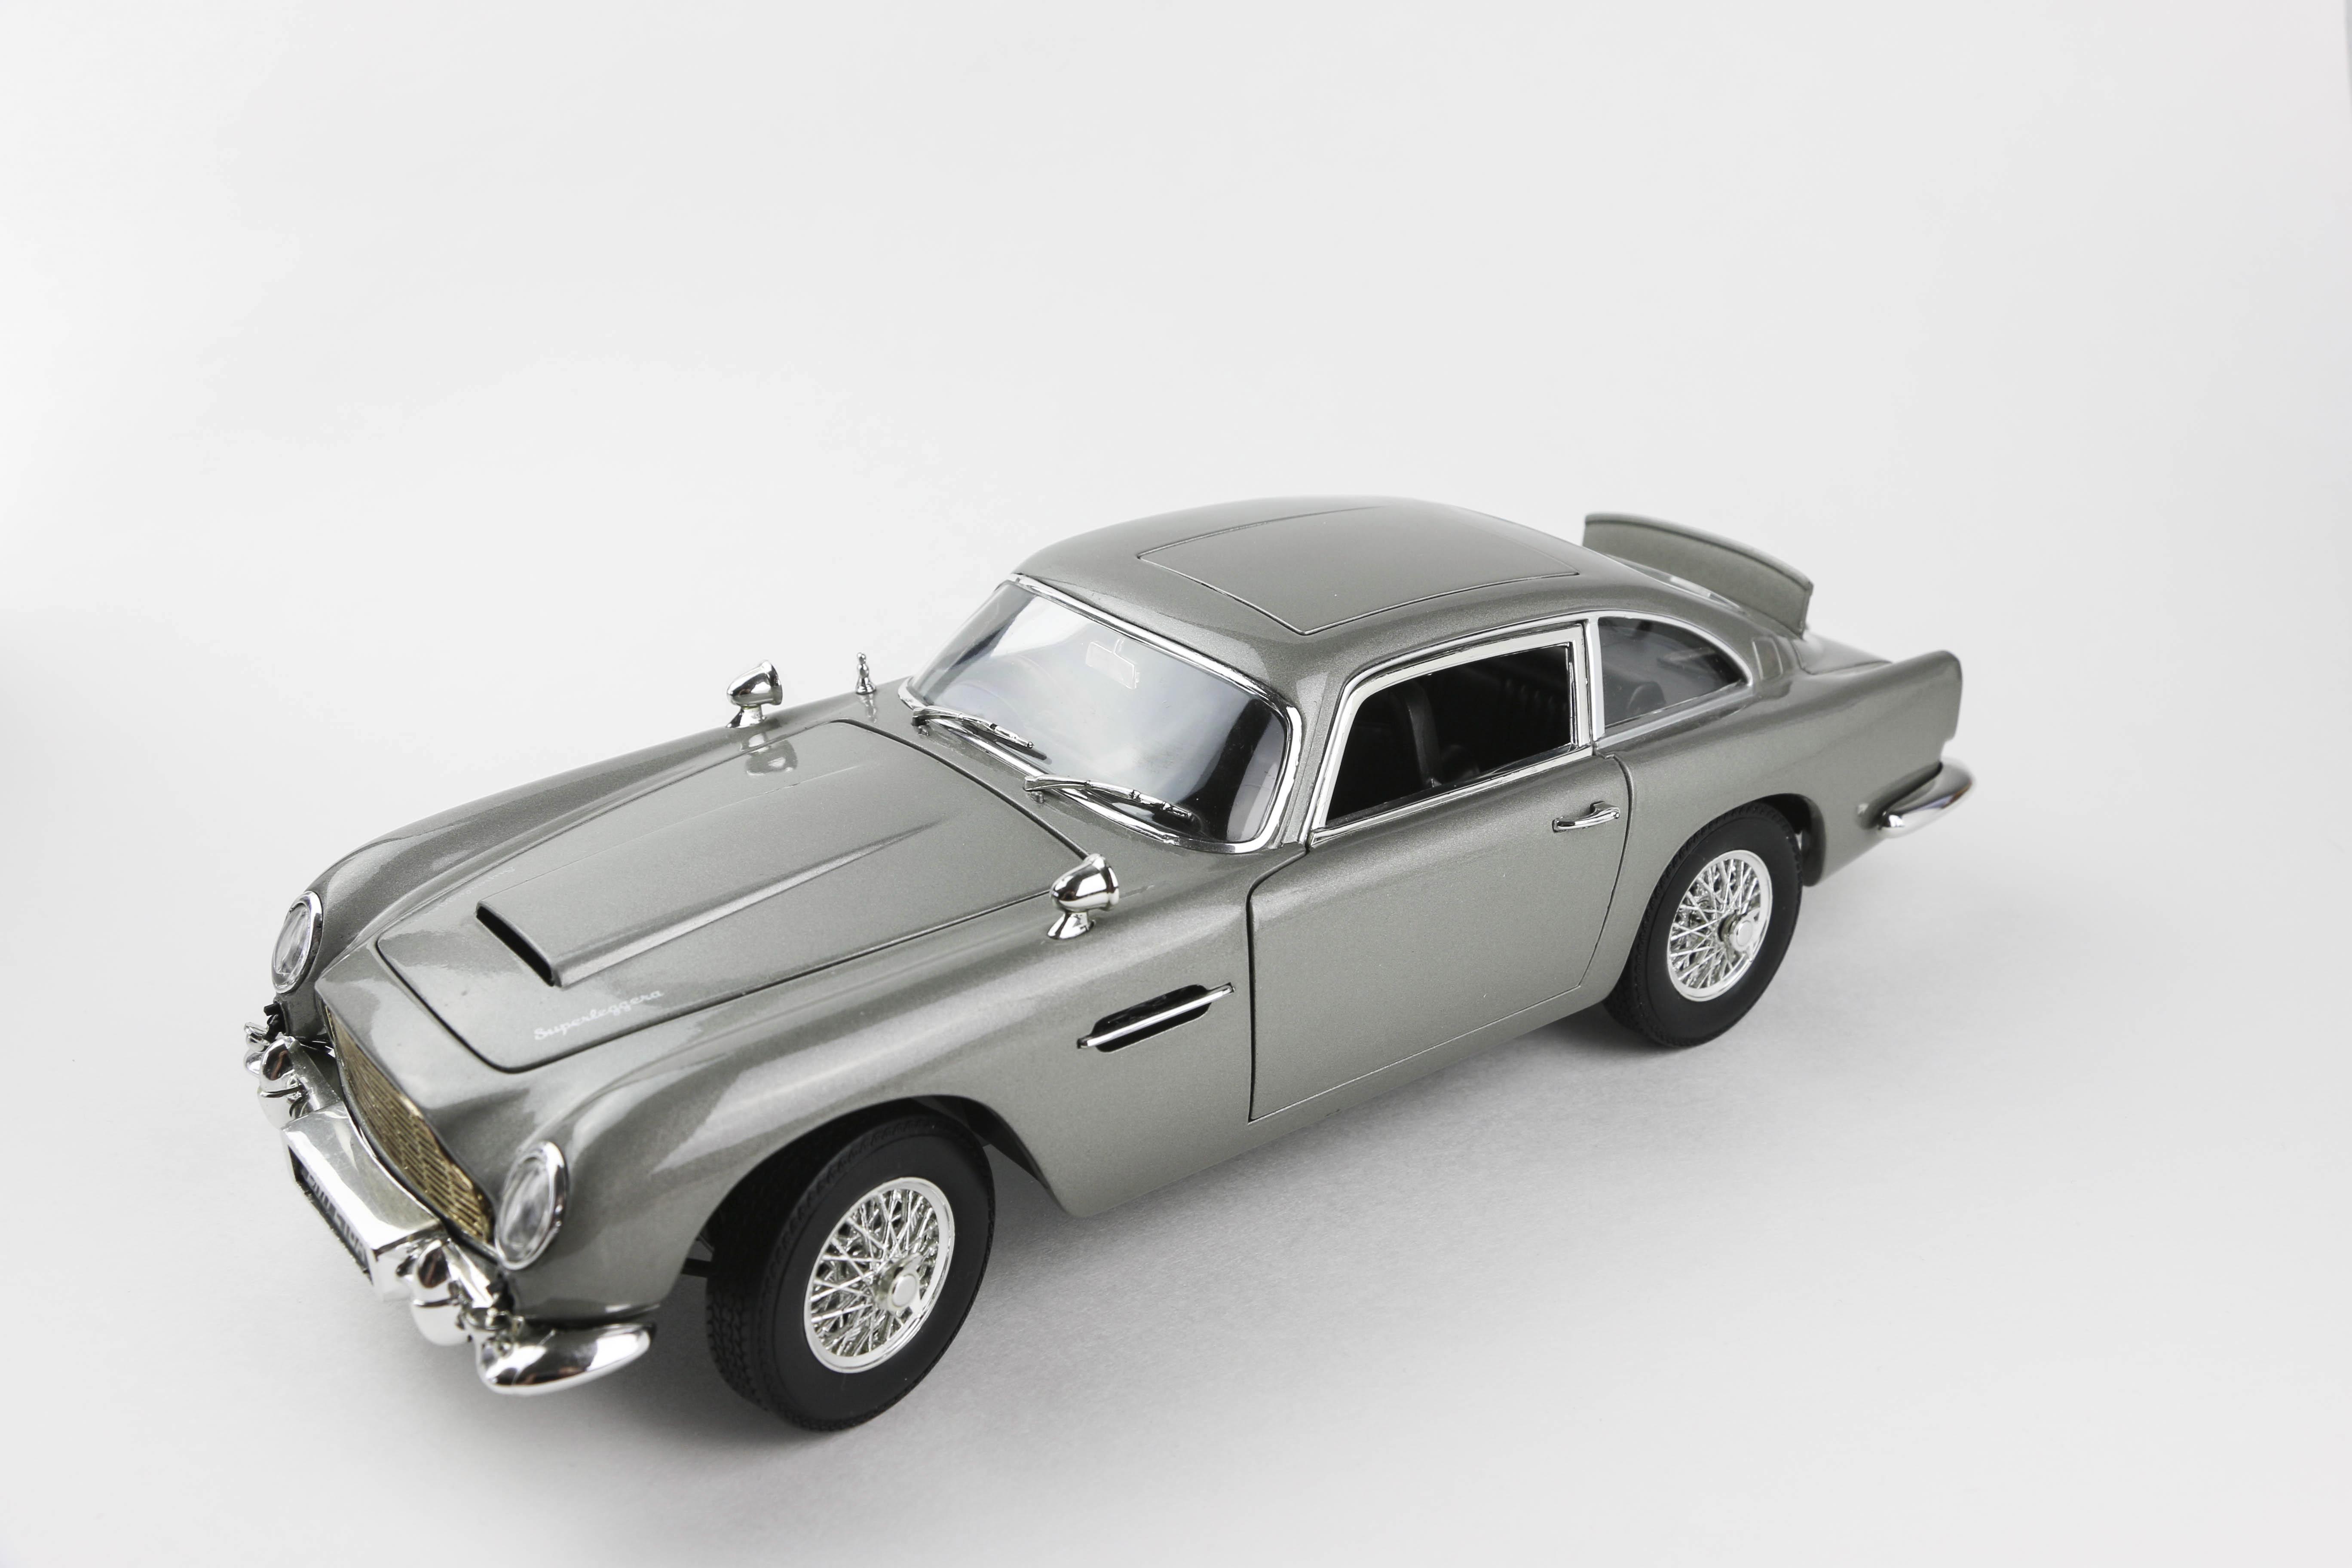 Cars of the Future_Double_James Bond Car_3.jpg